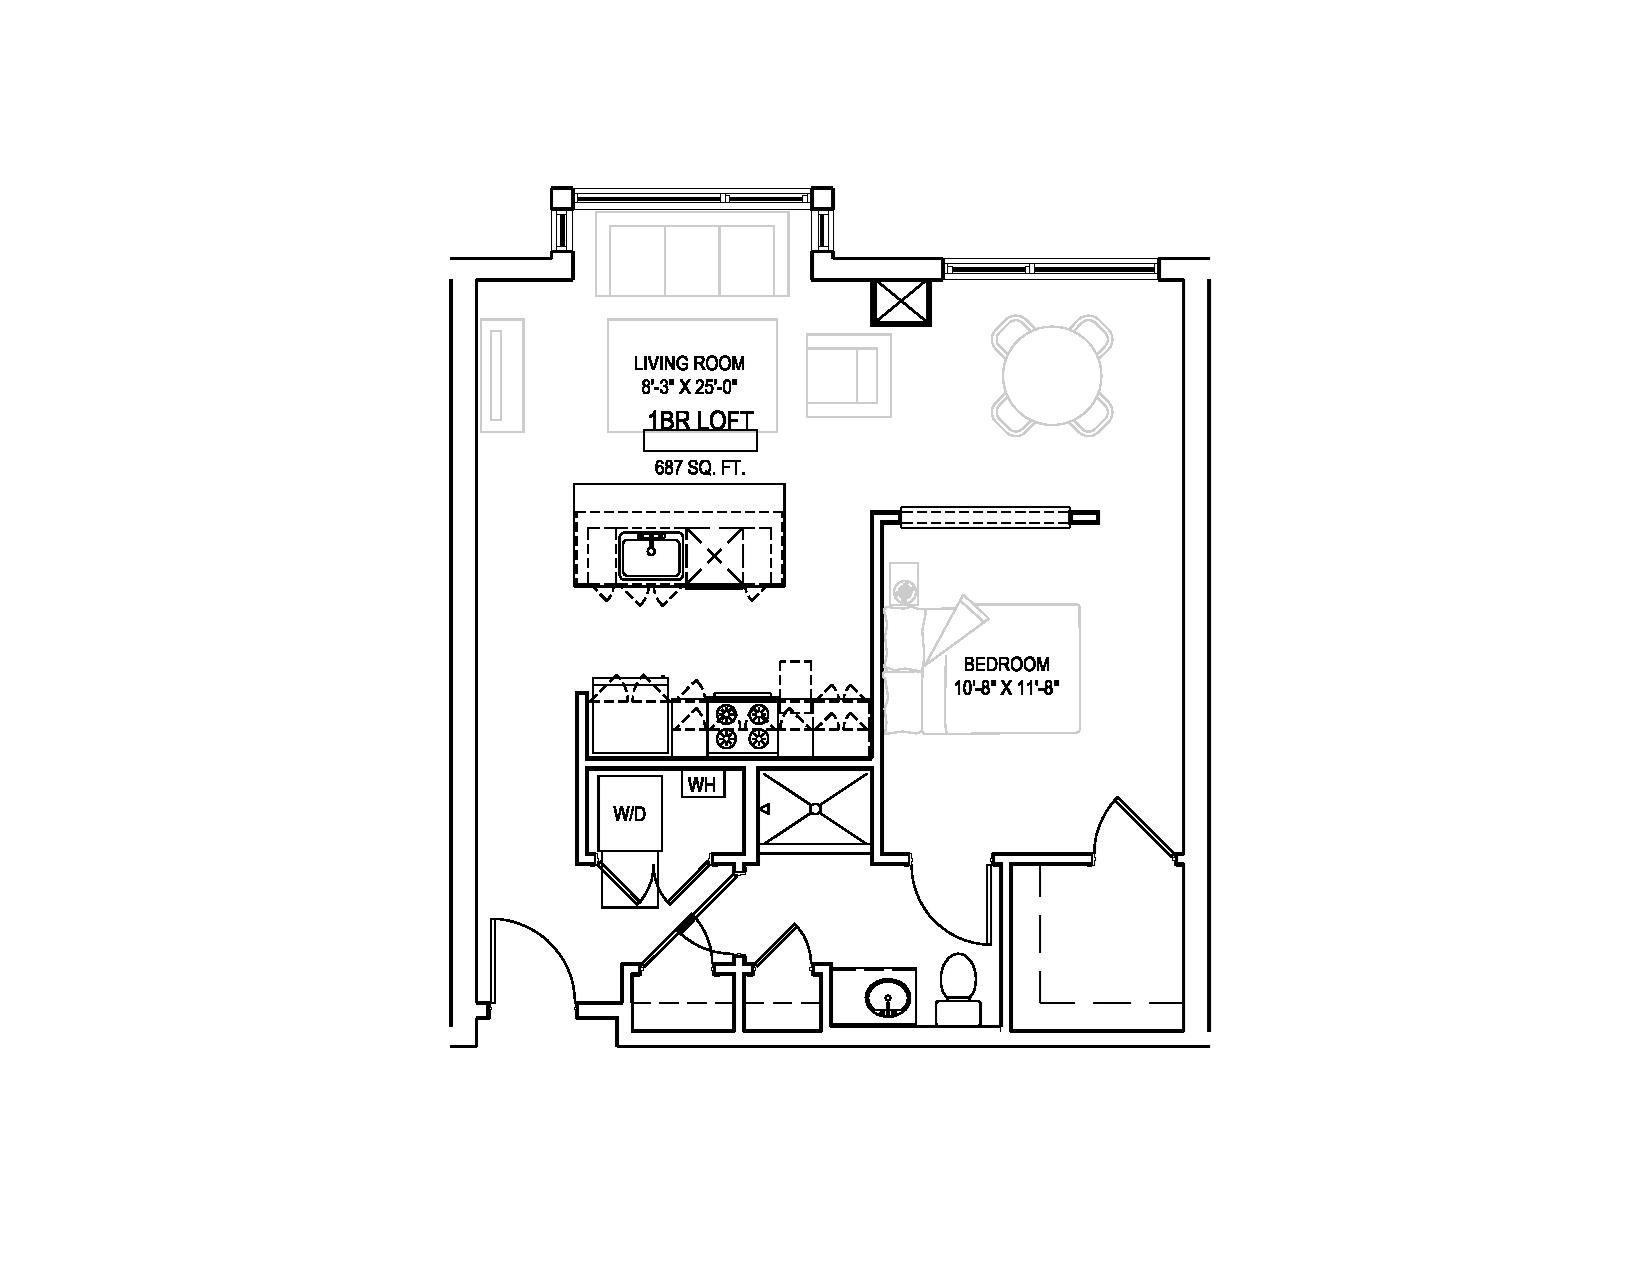 One bed Loft/One bath - 687 sqft. Floor Plan 14